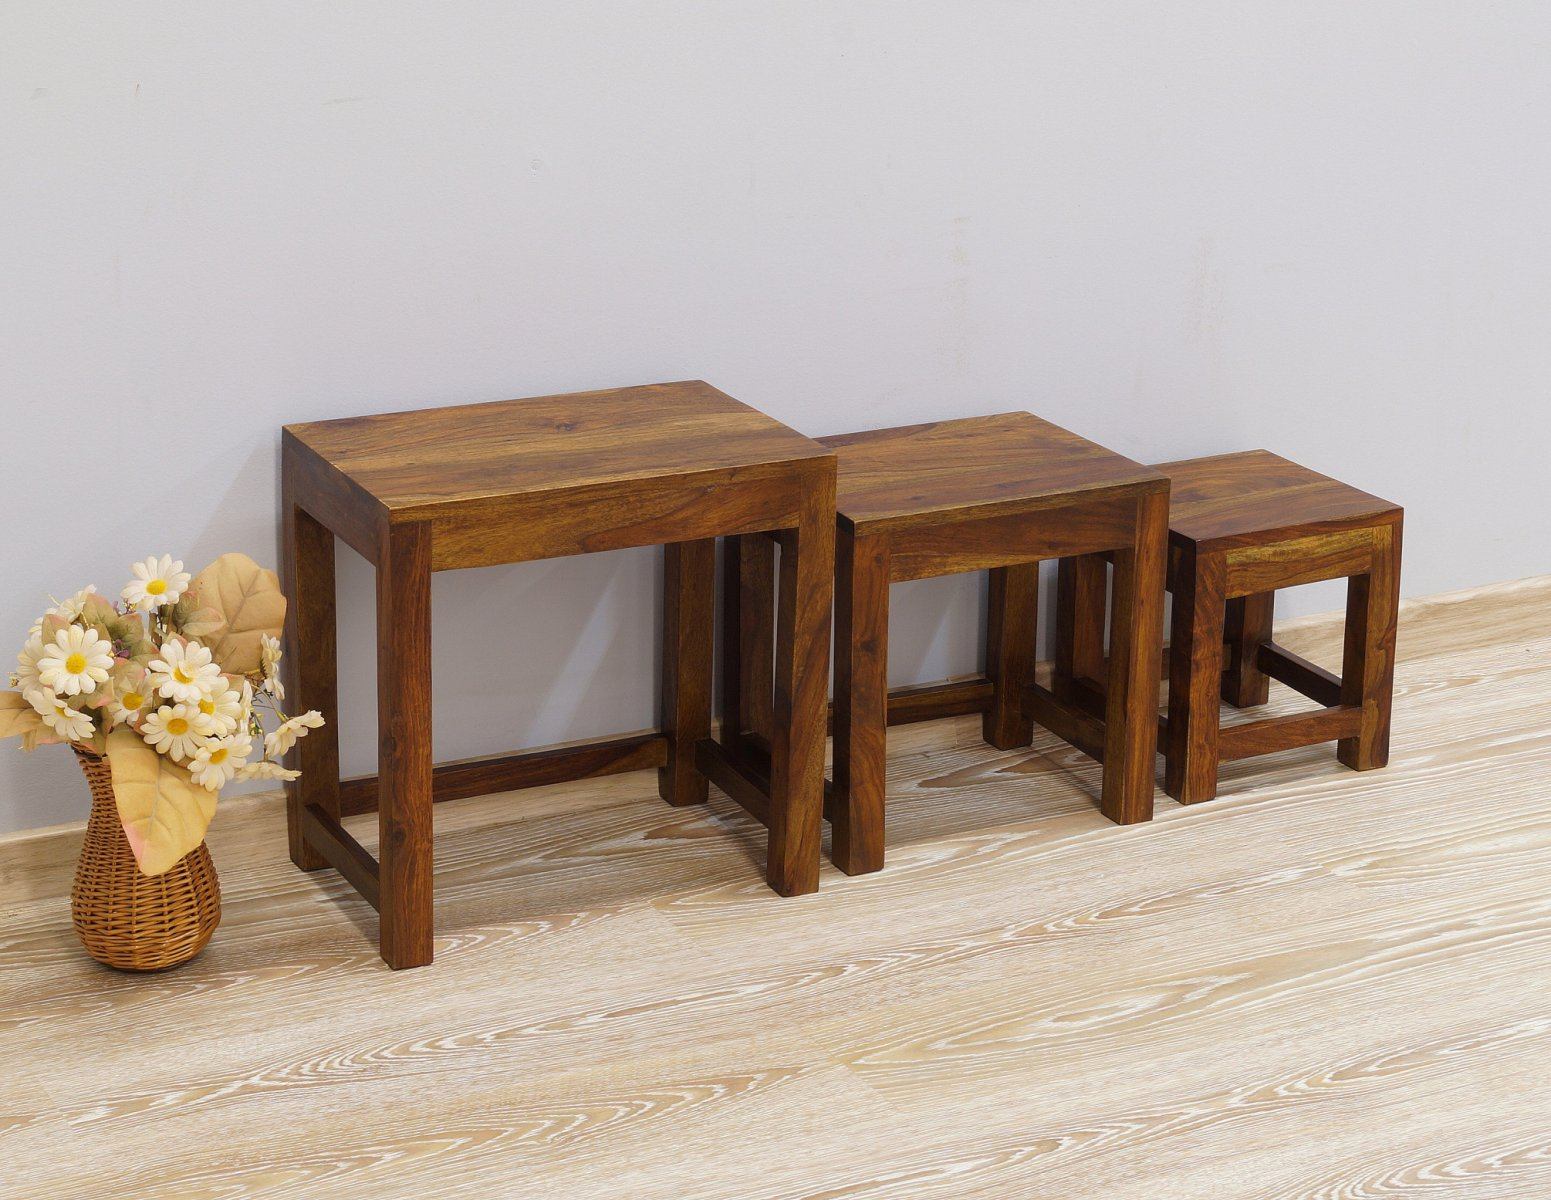 Taboret kolonialny stolik stołek lite drewno palisander indyjski 3 sztuki